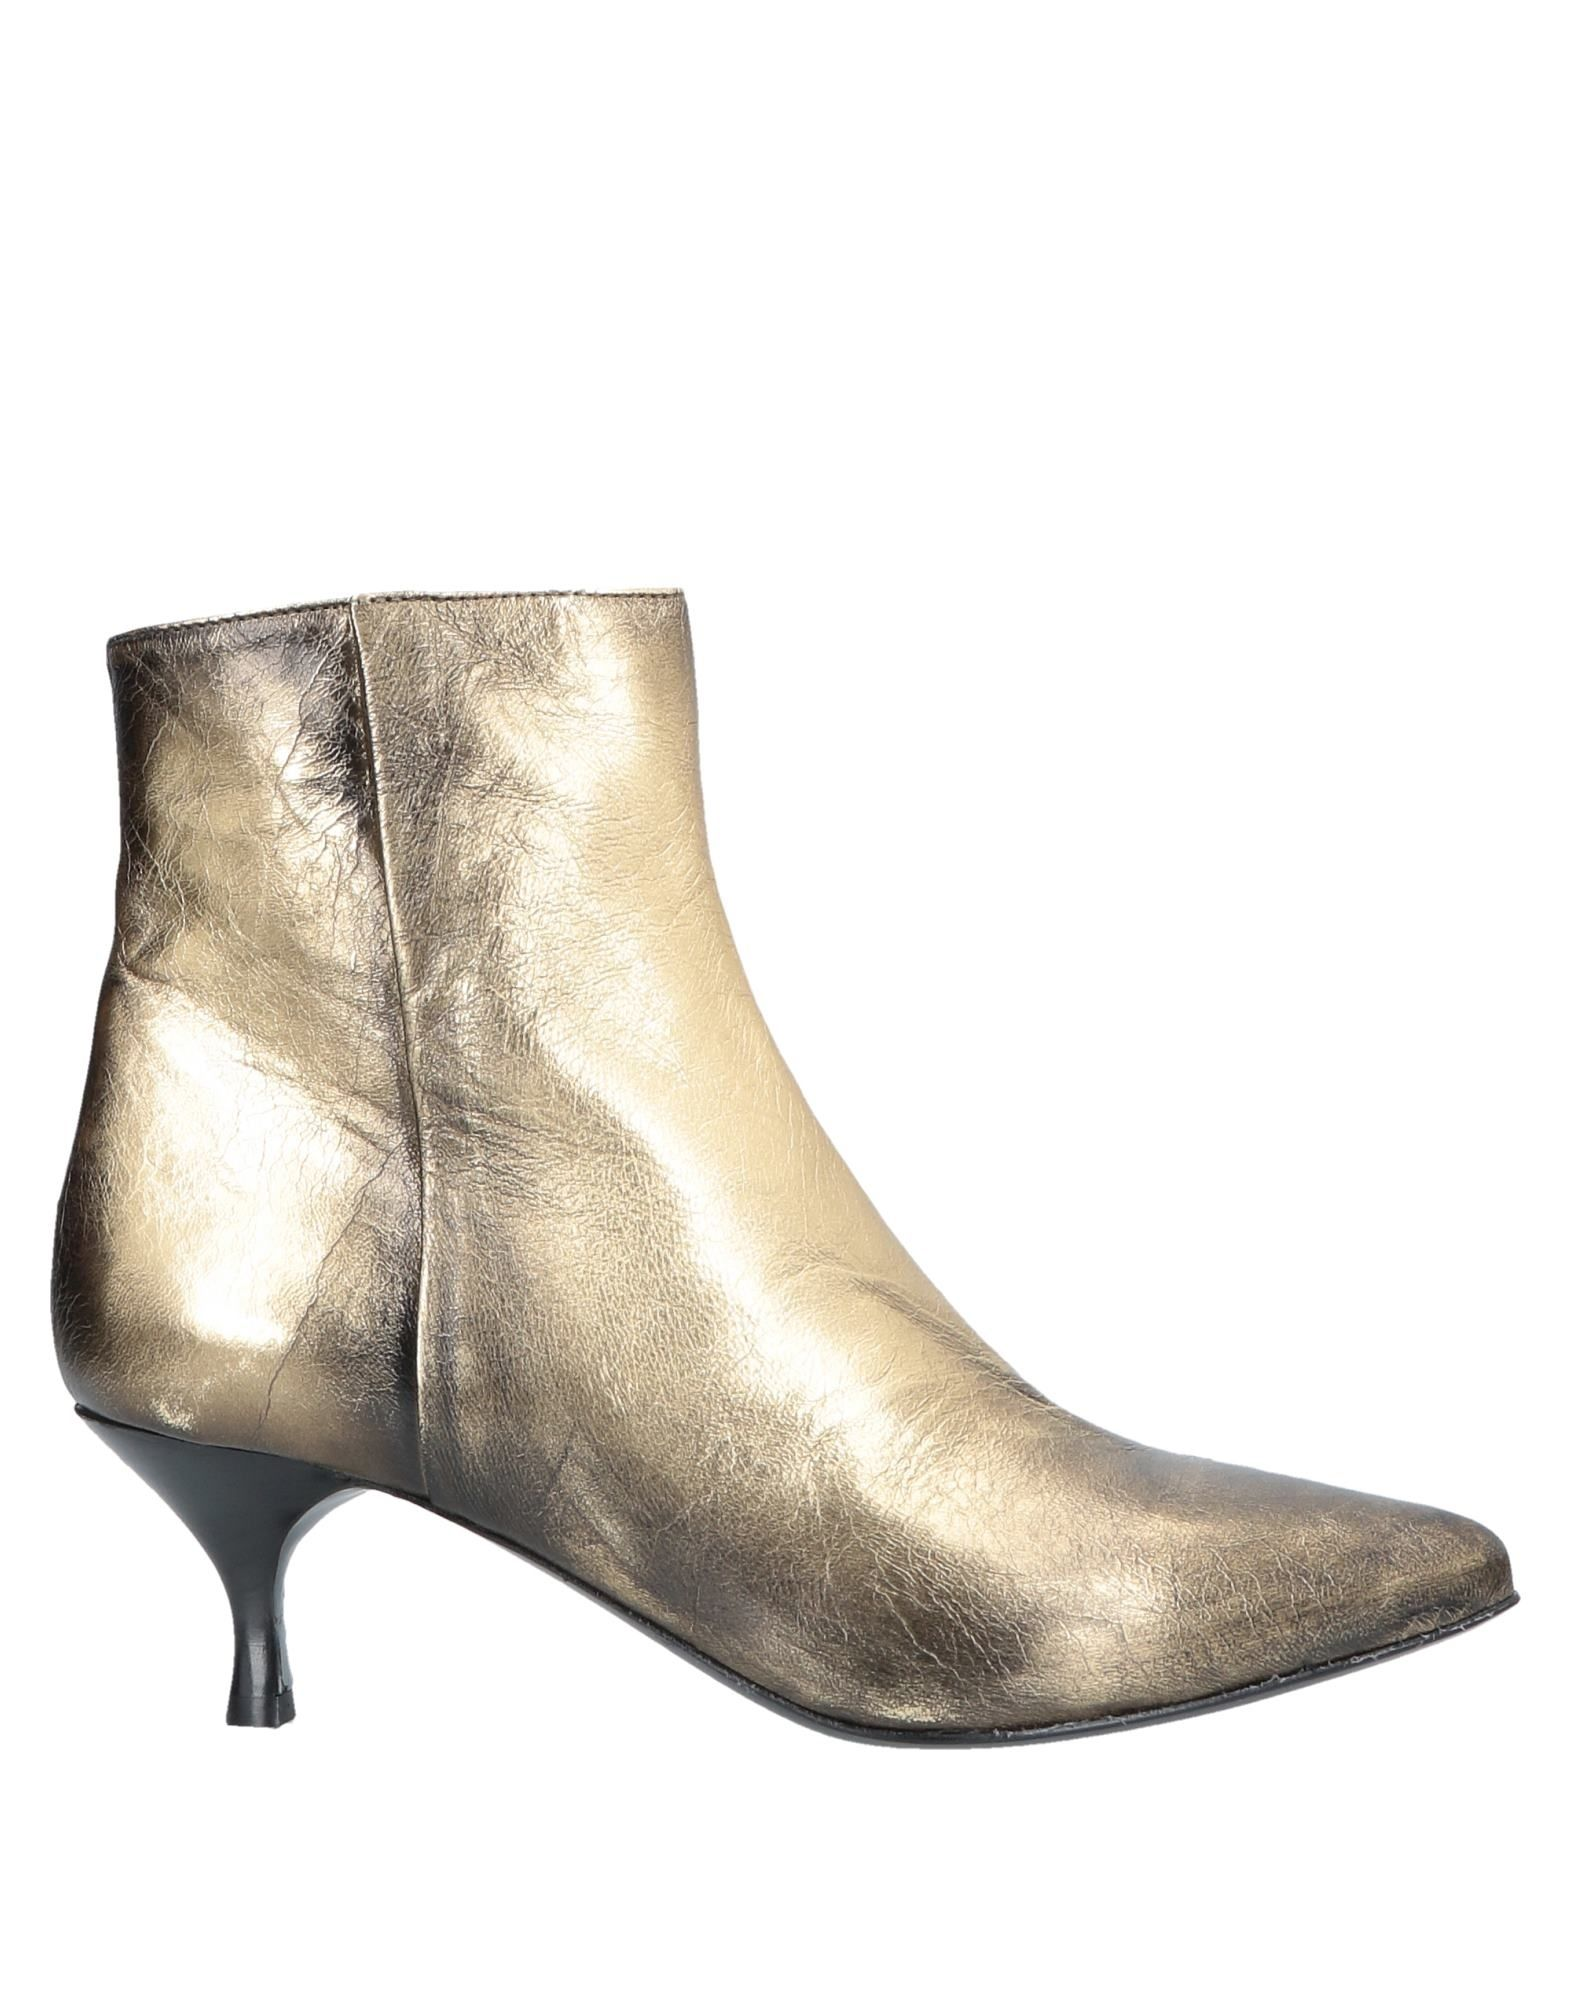 ELENA IACHI Полусапоги и высокие ботинки 1kg bag color toner powder dust for xerox docuprint cp405 405d cp405df cm405 cm405d cm405df ct202018 ct202019 ct202020 ct202021